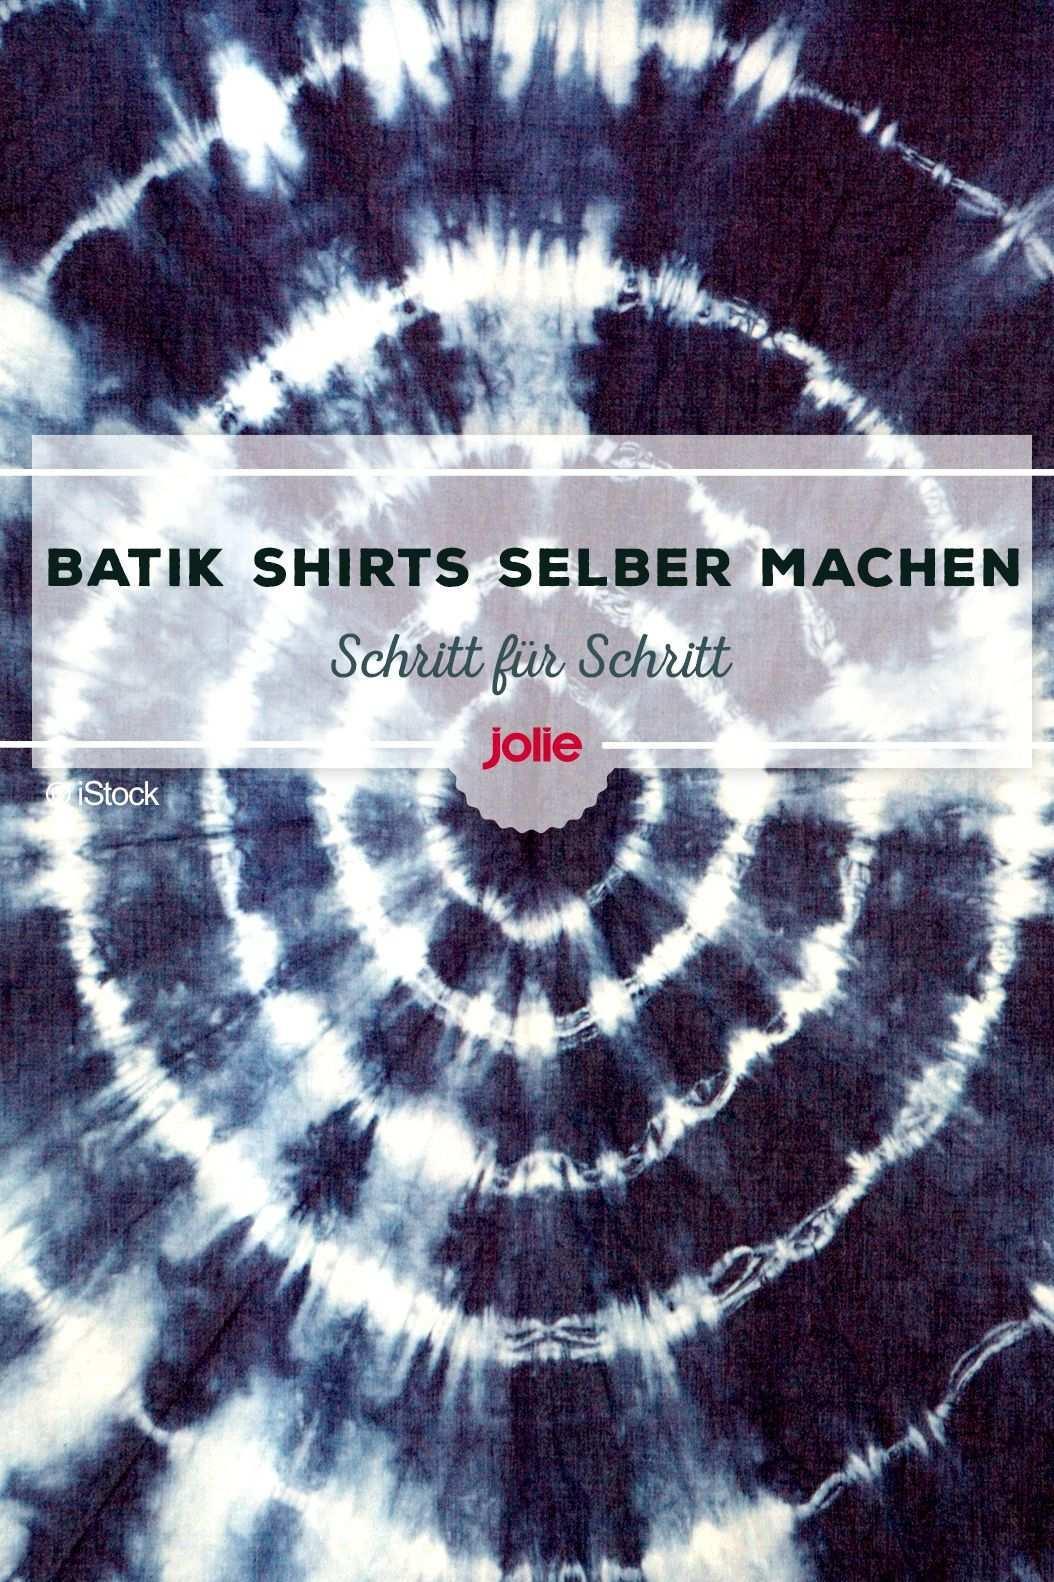 Batiken Die Einfachste Batik Anleitung Im Netz Batik Shirt Batik Anleitungen